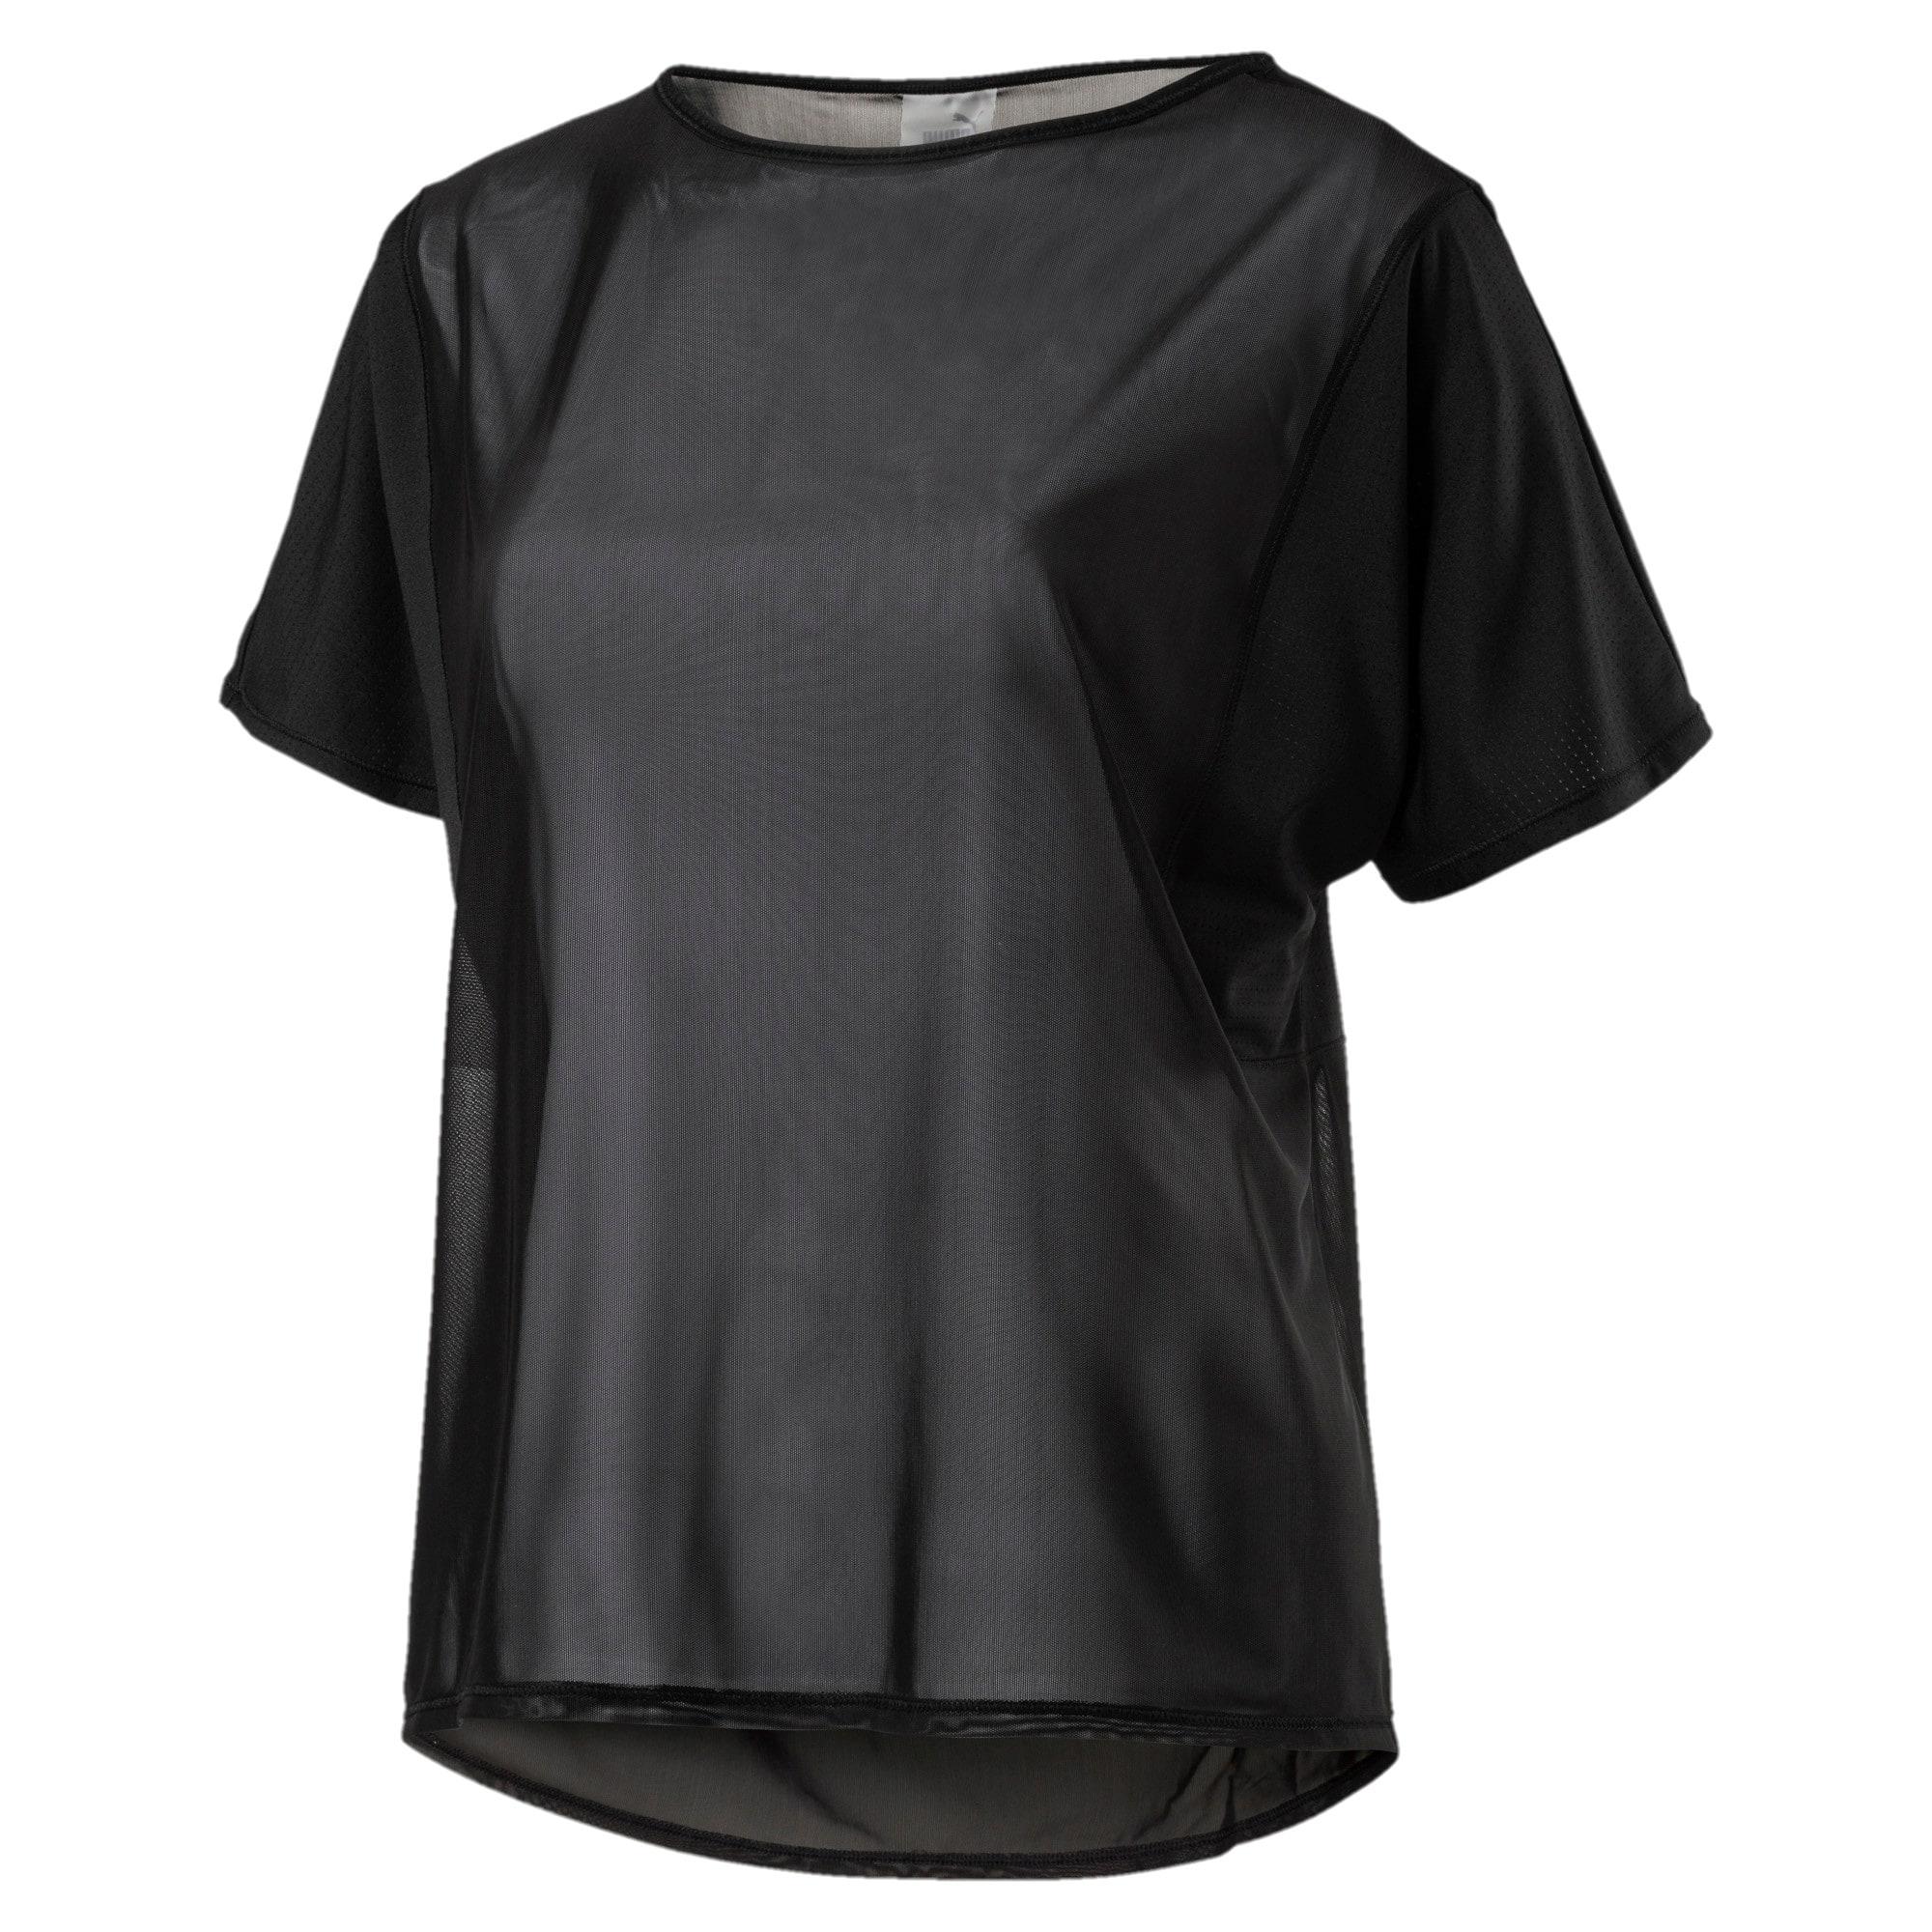 Thumbnail 1 of Explosive Women's Short Sleeve Training Top, Puma Black, medium-IND